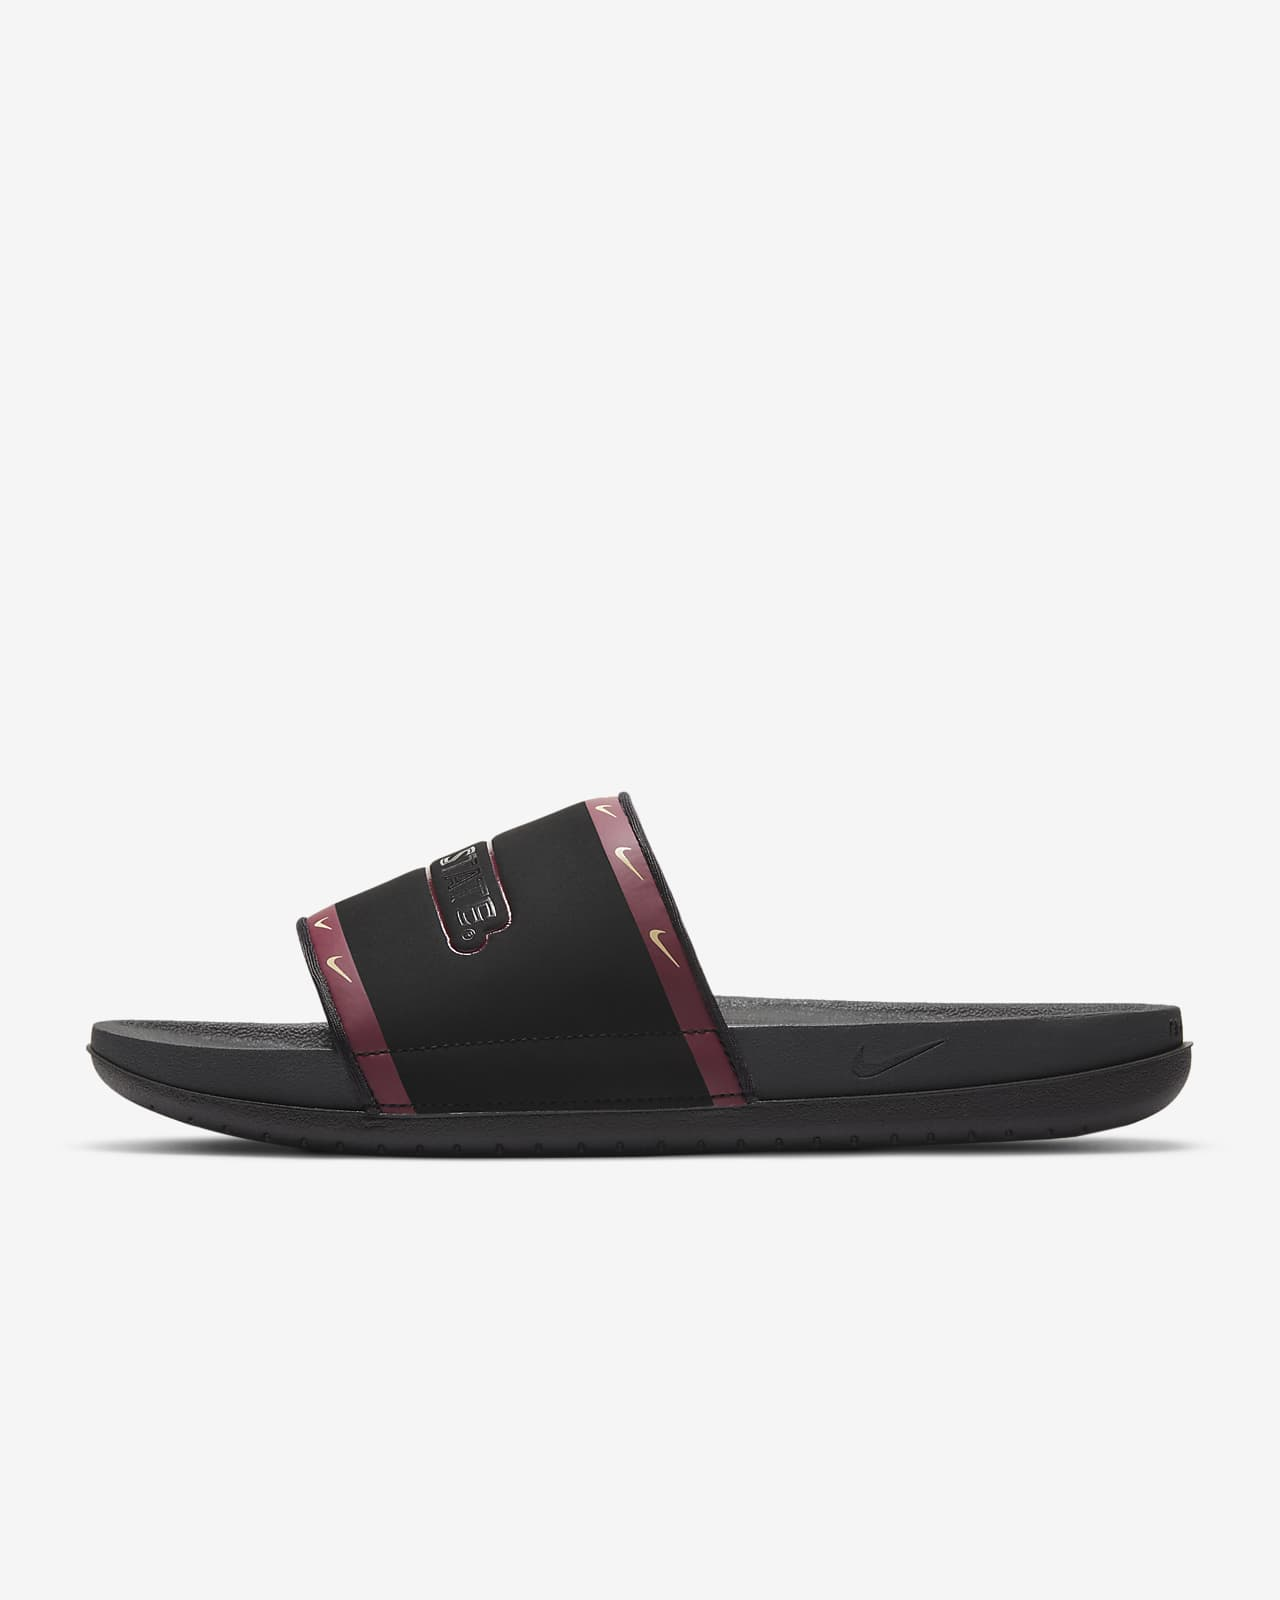 Nike Offcourt (Florida State) Slide